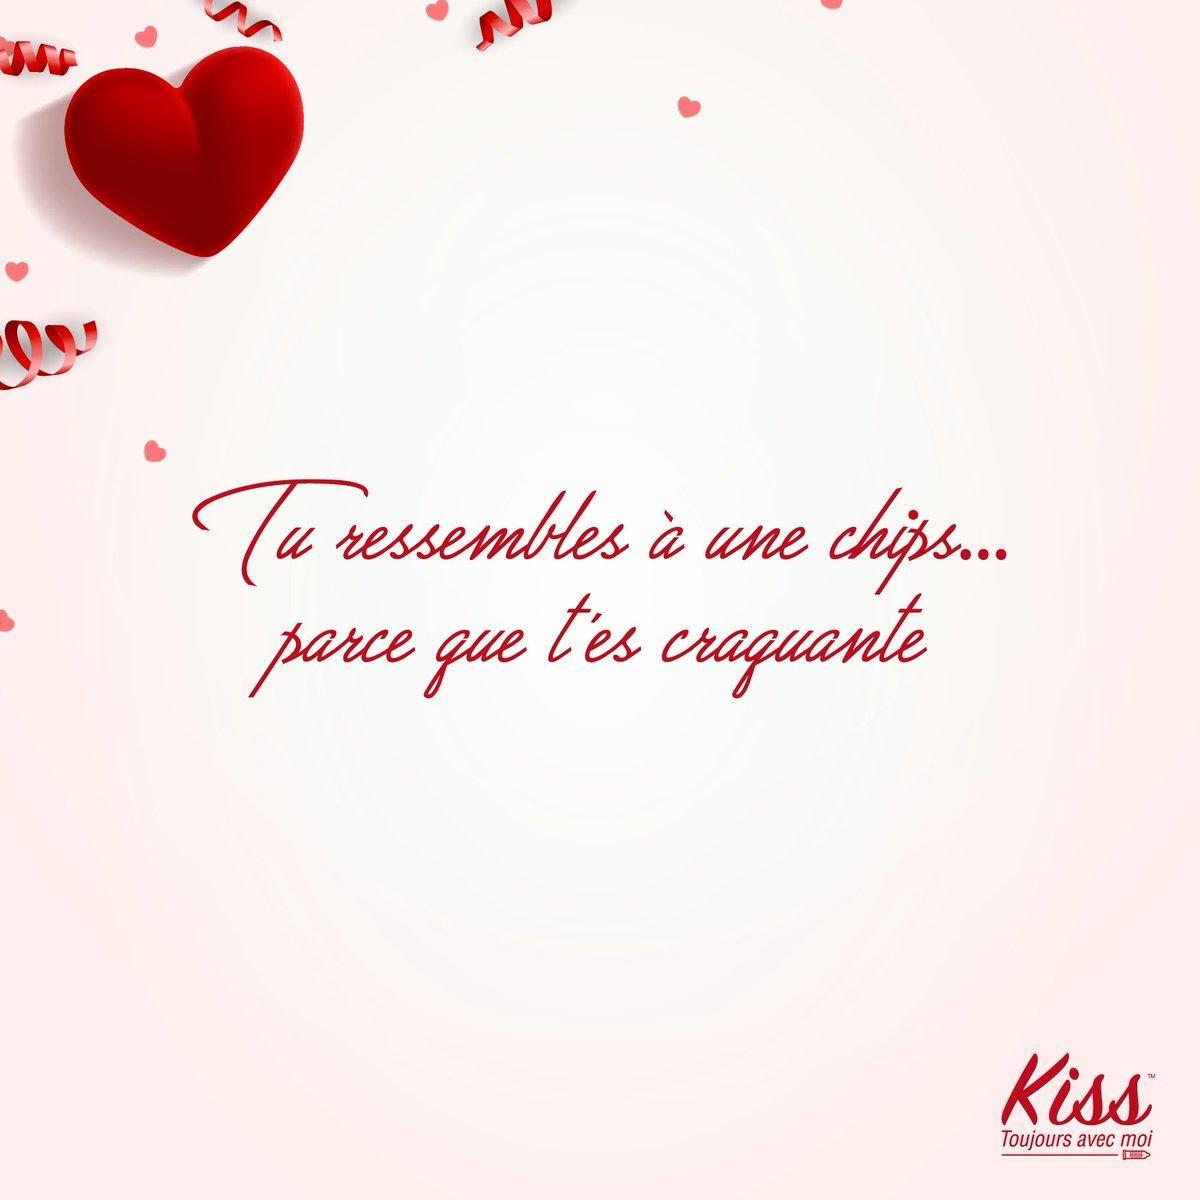 #SaintValentin la déclaration craquante !  #Valentines #Kiss #ToujoursAvecMoi #AdopteKiss<br>http://pic.twitter.com/fjfq6Nt9FA